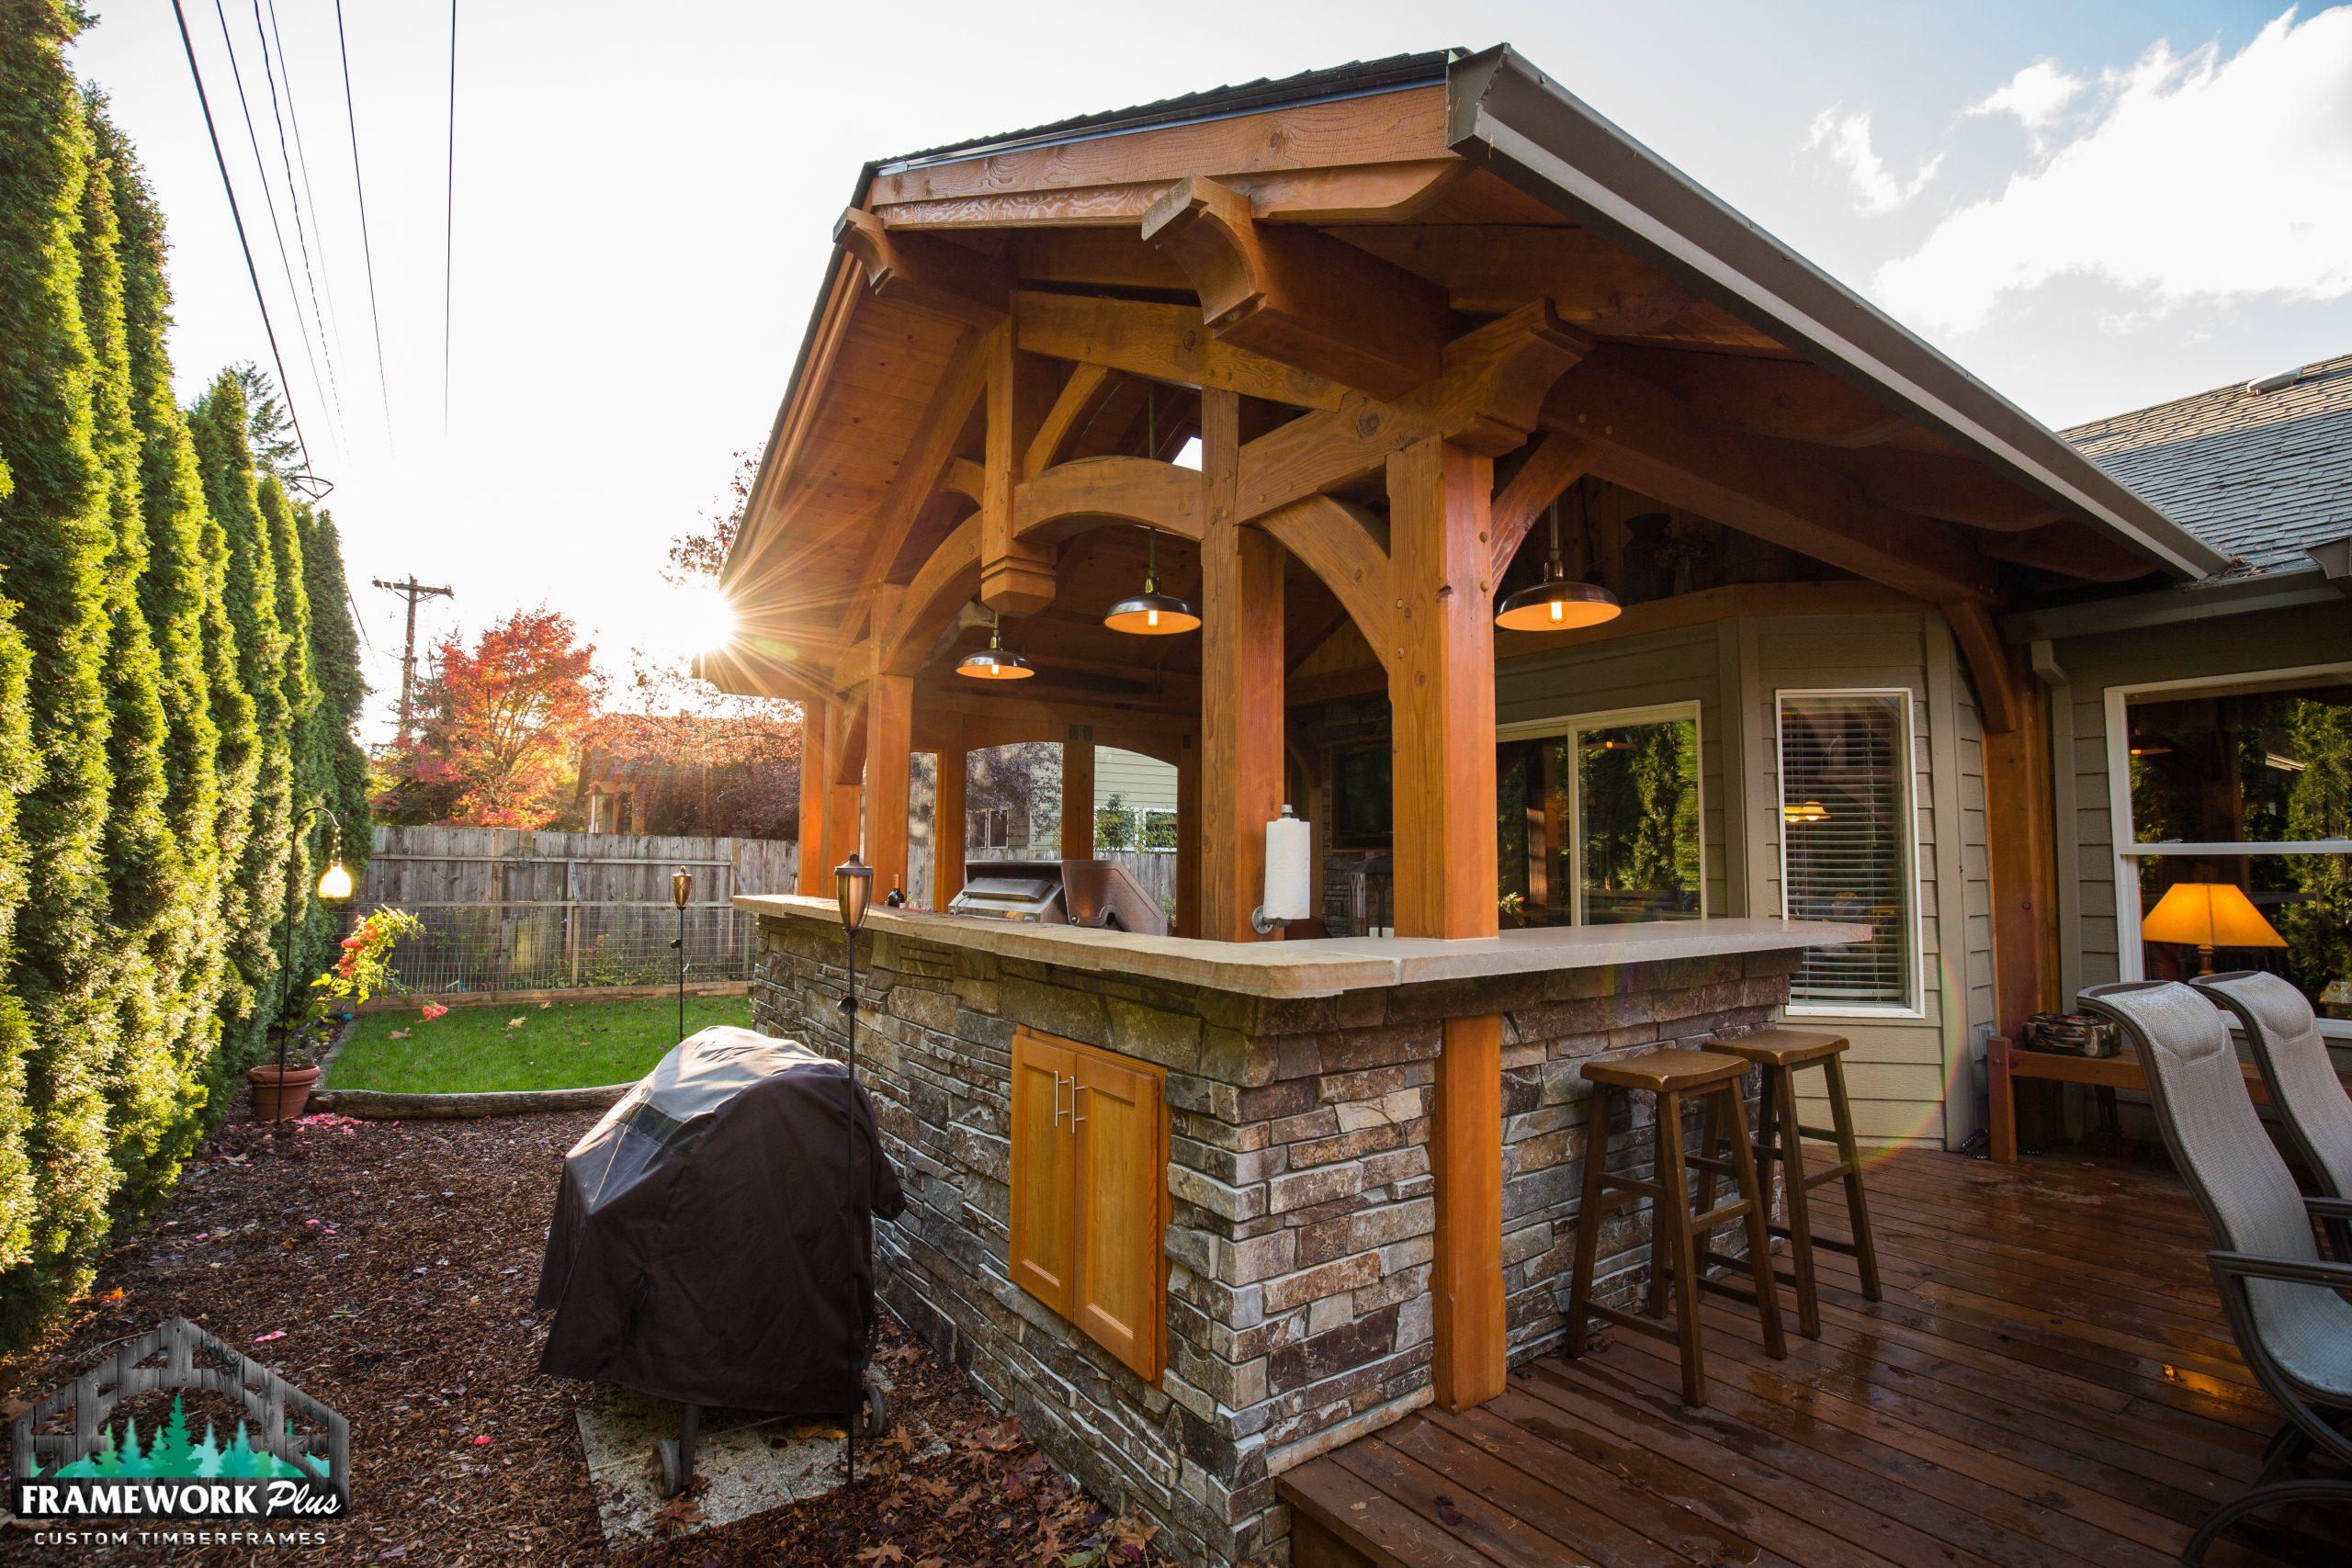 home frame work plus timber frames